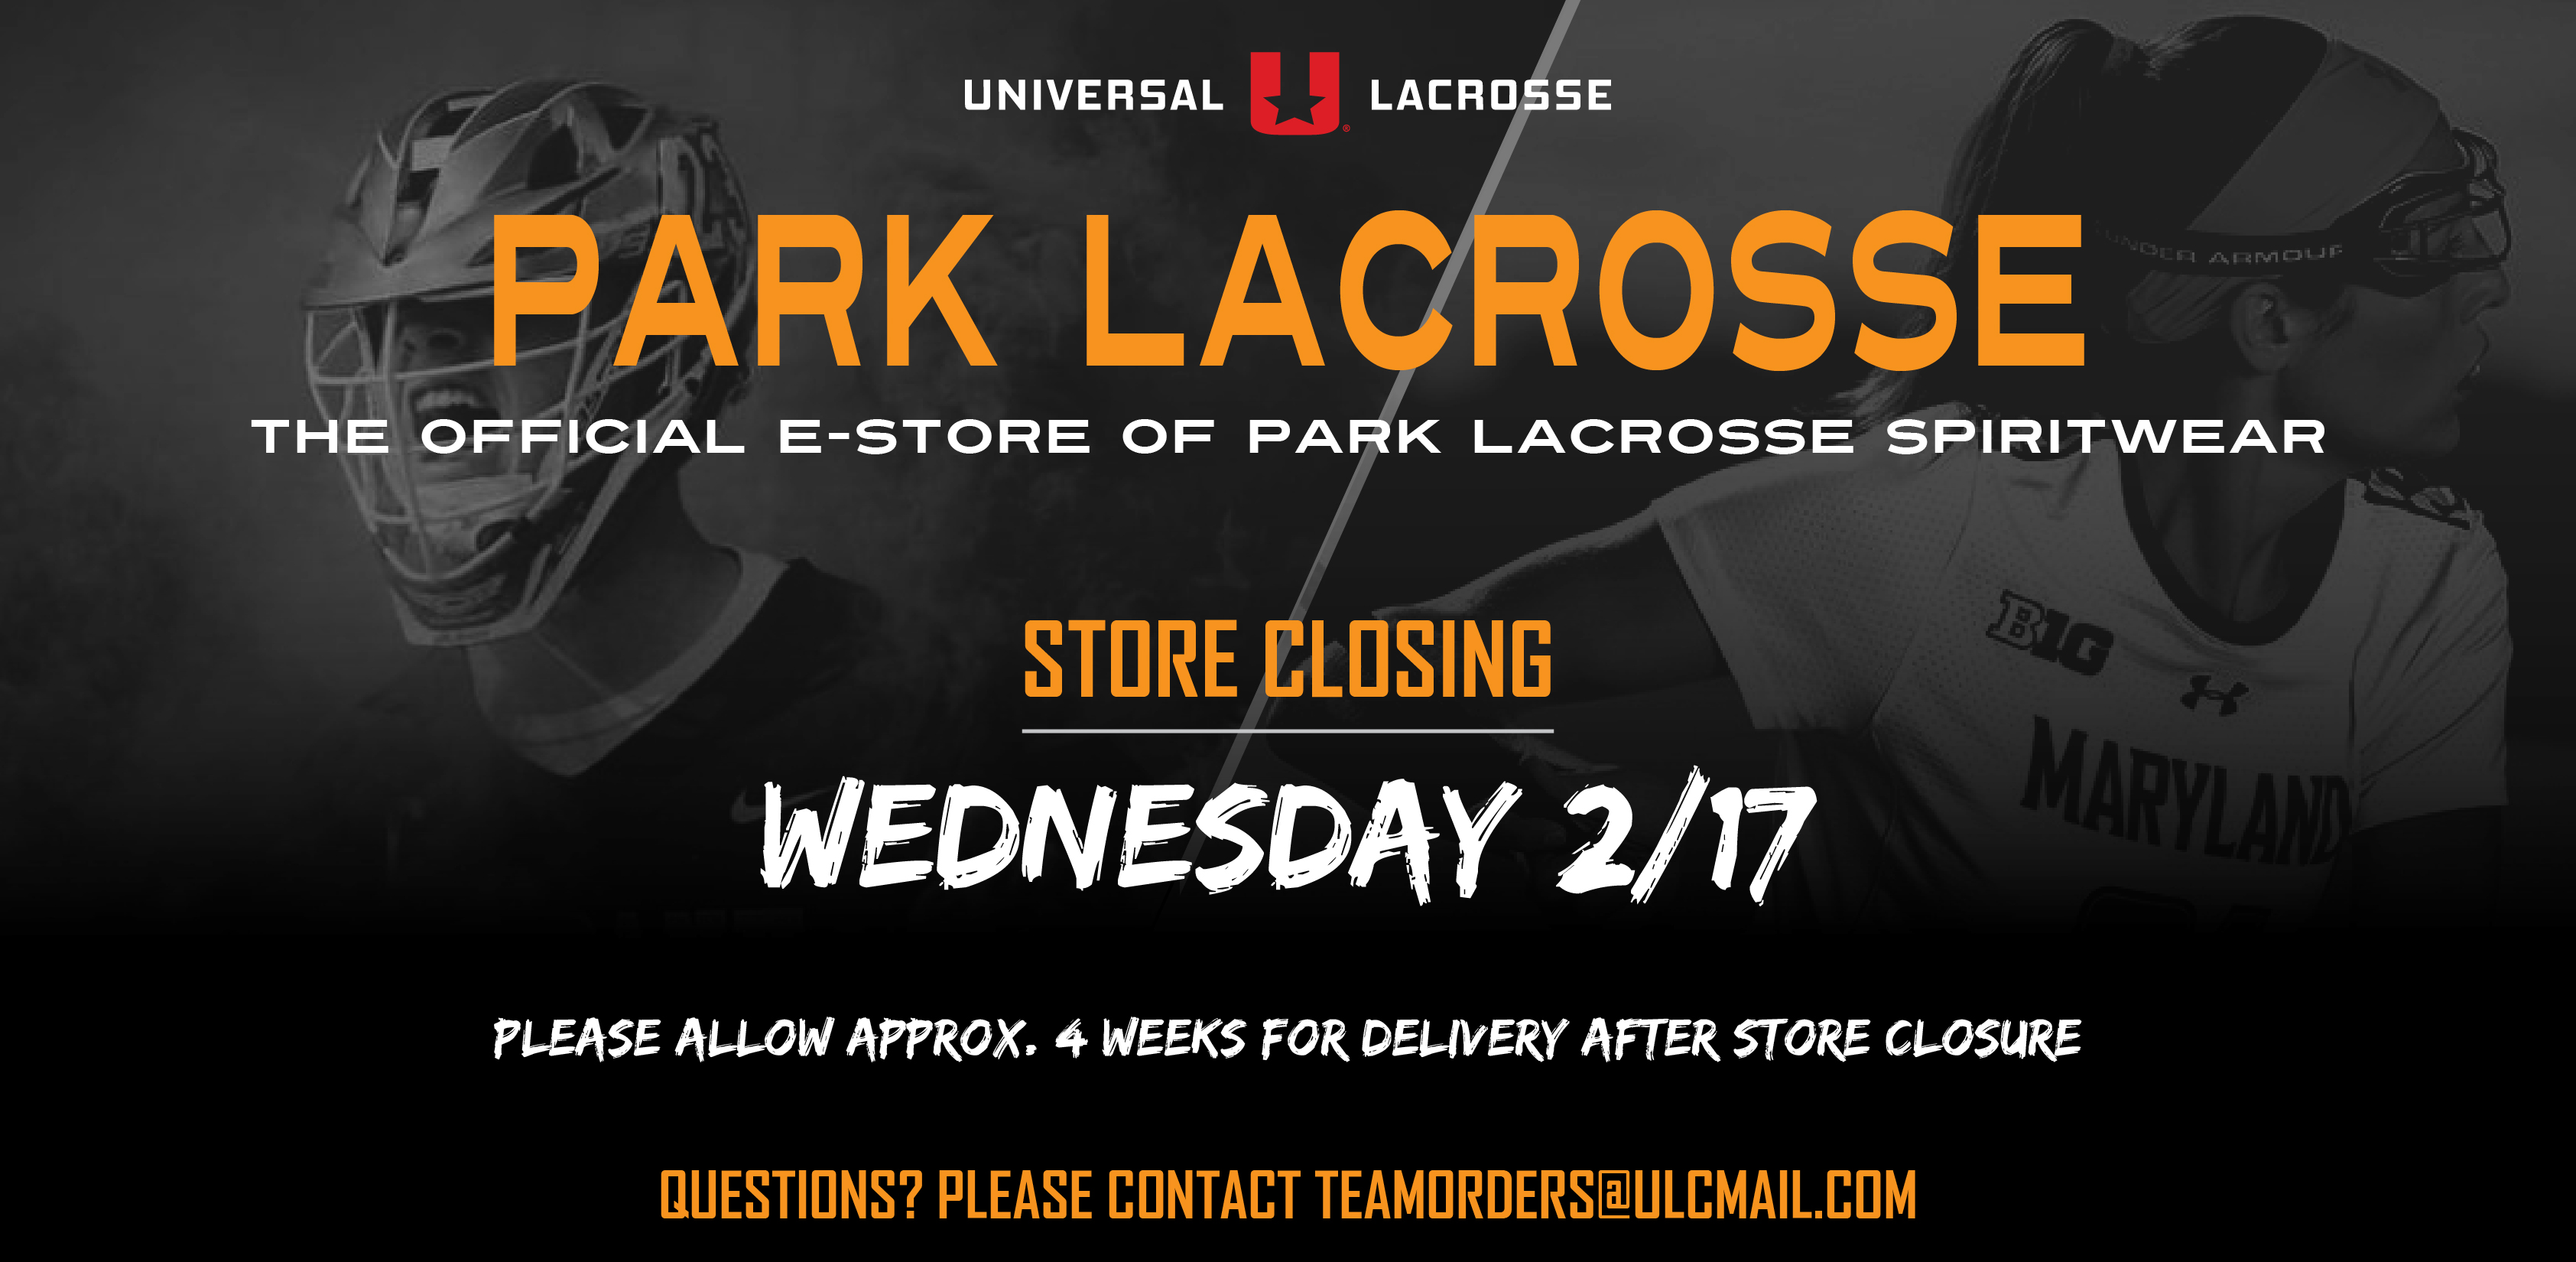 Park Lacrosse Spiritwear